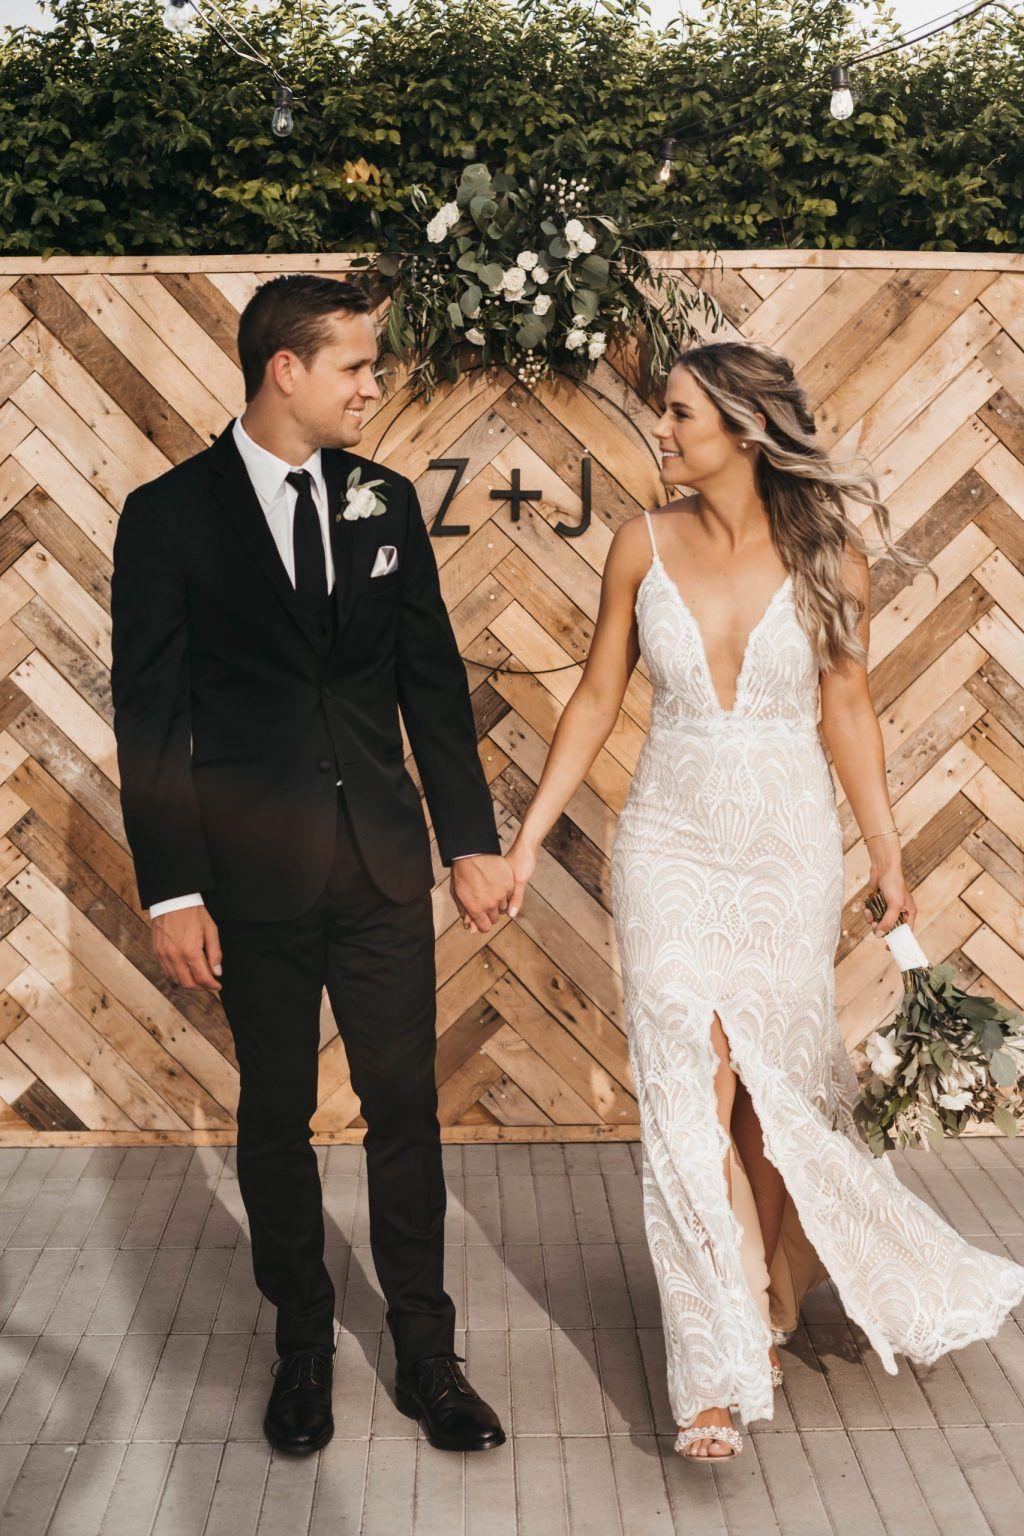 Pin On Wedding Blog Posts